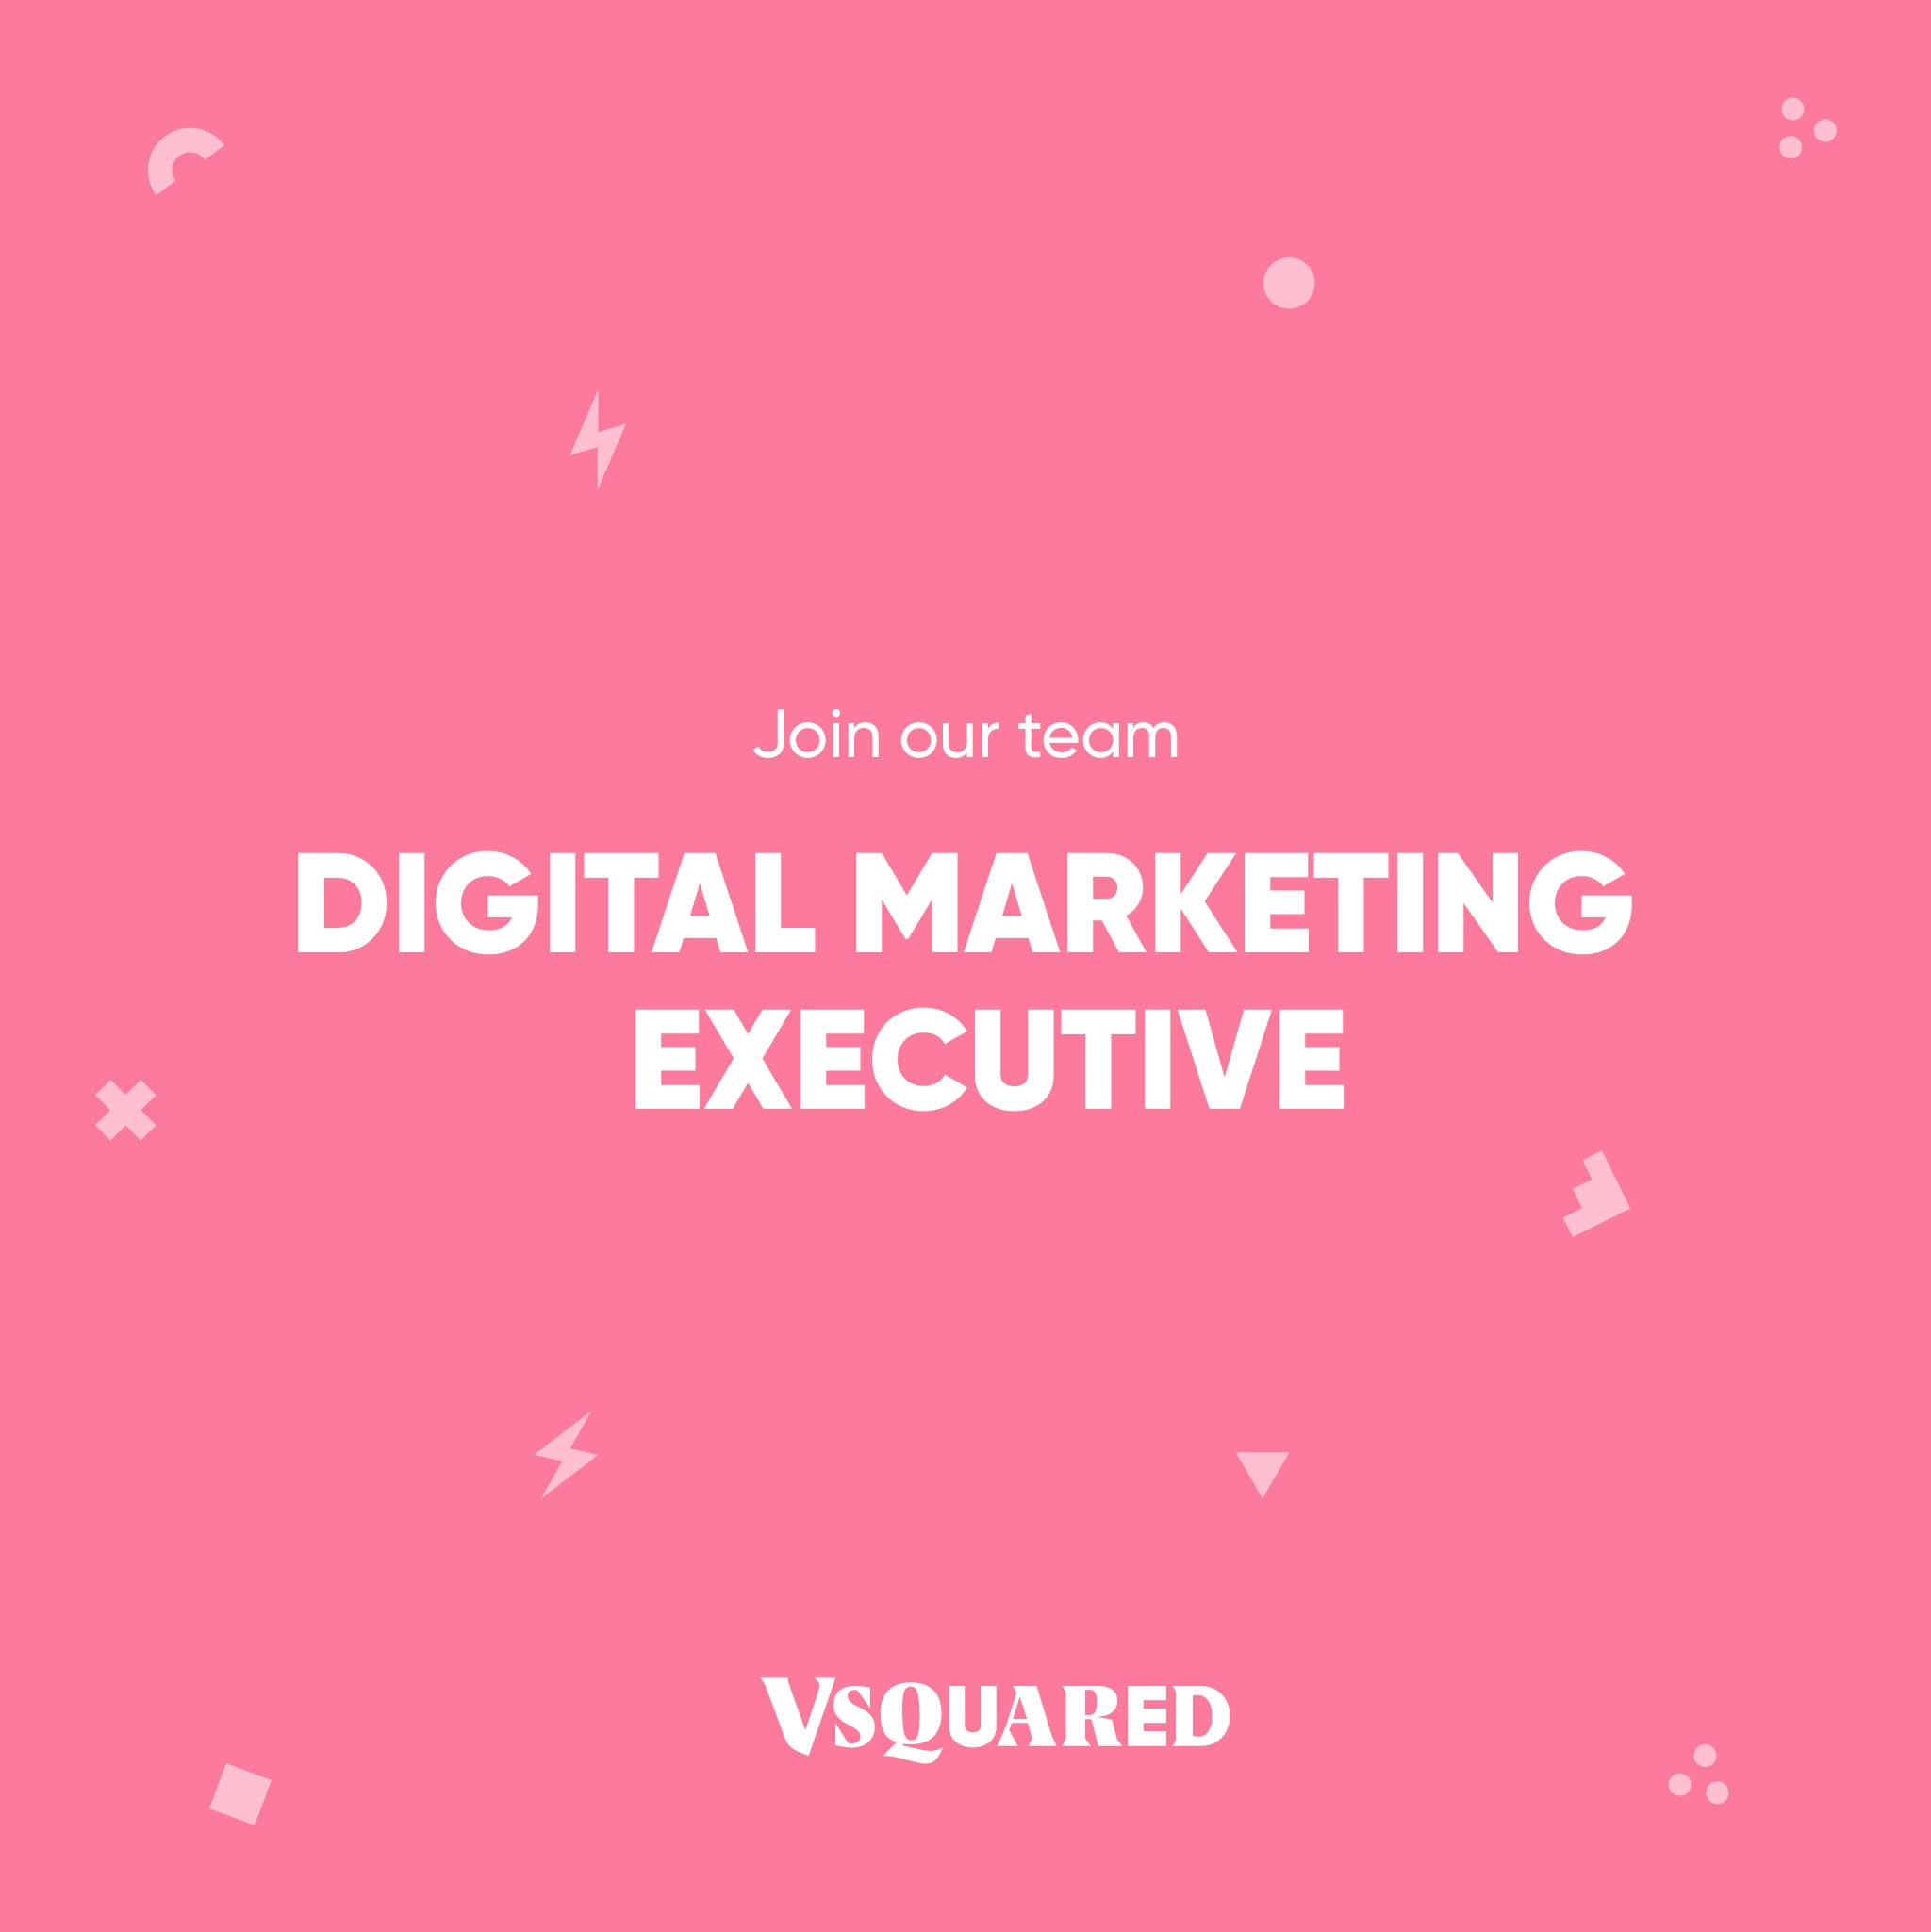 VSQUARED Digital Marketing Executive